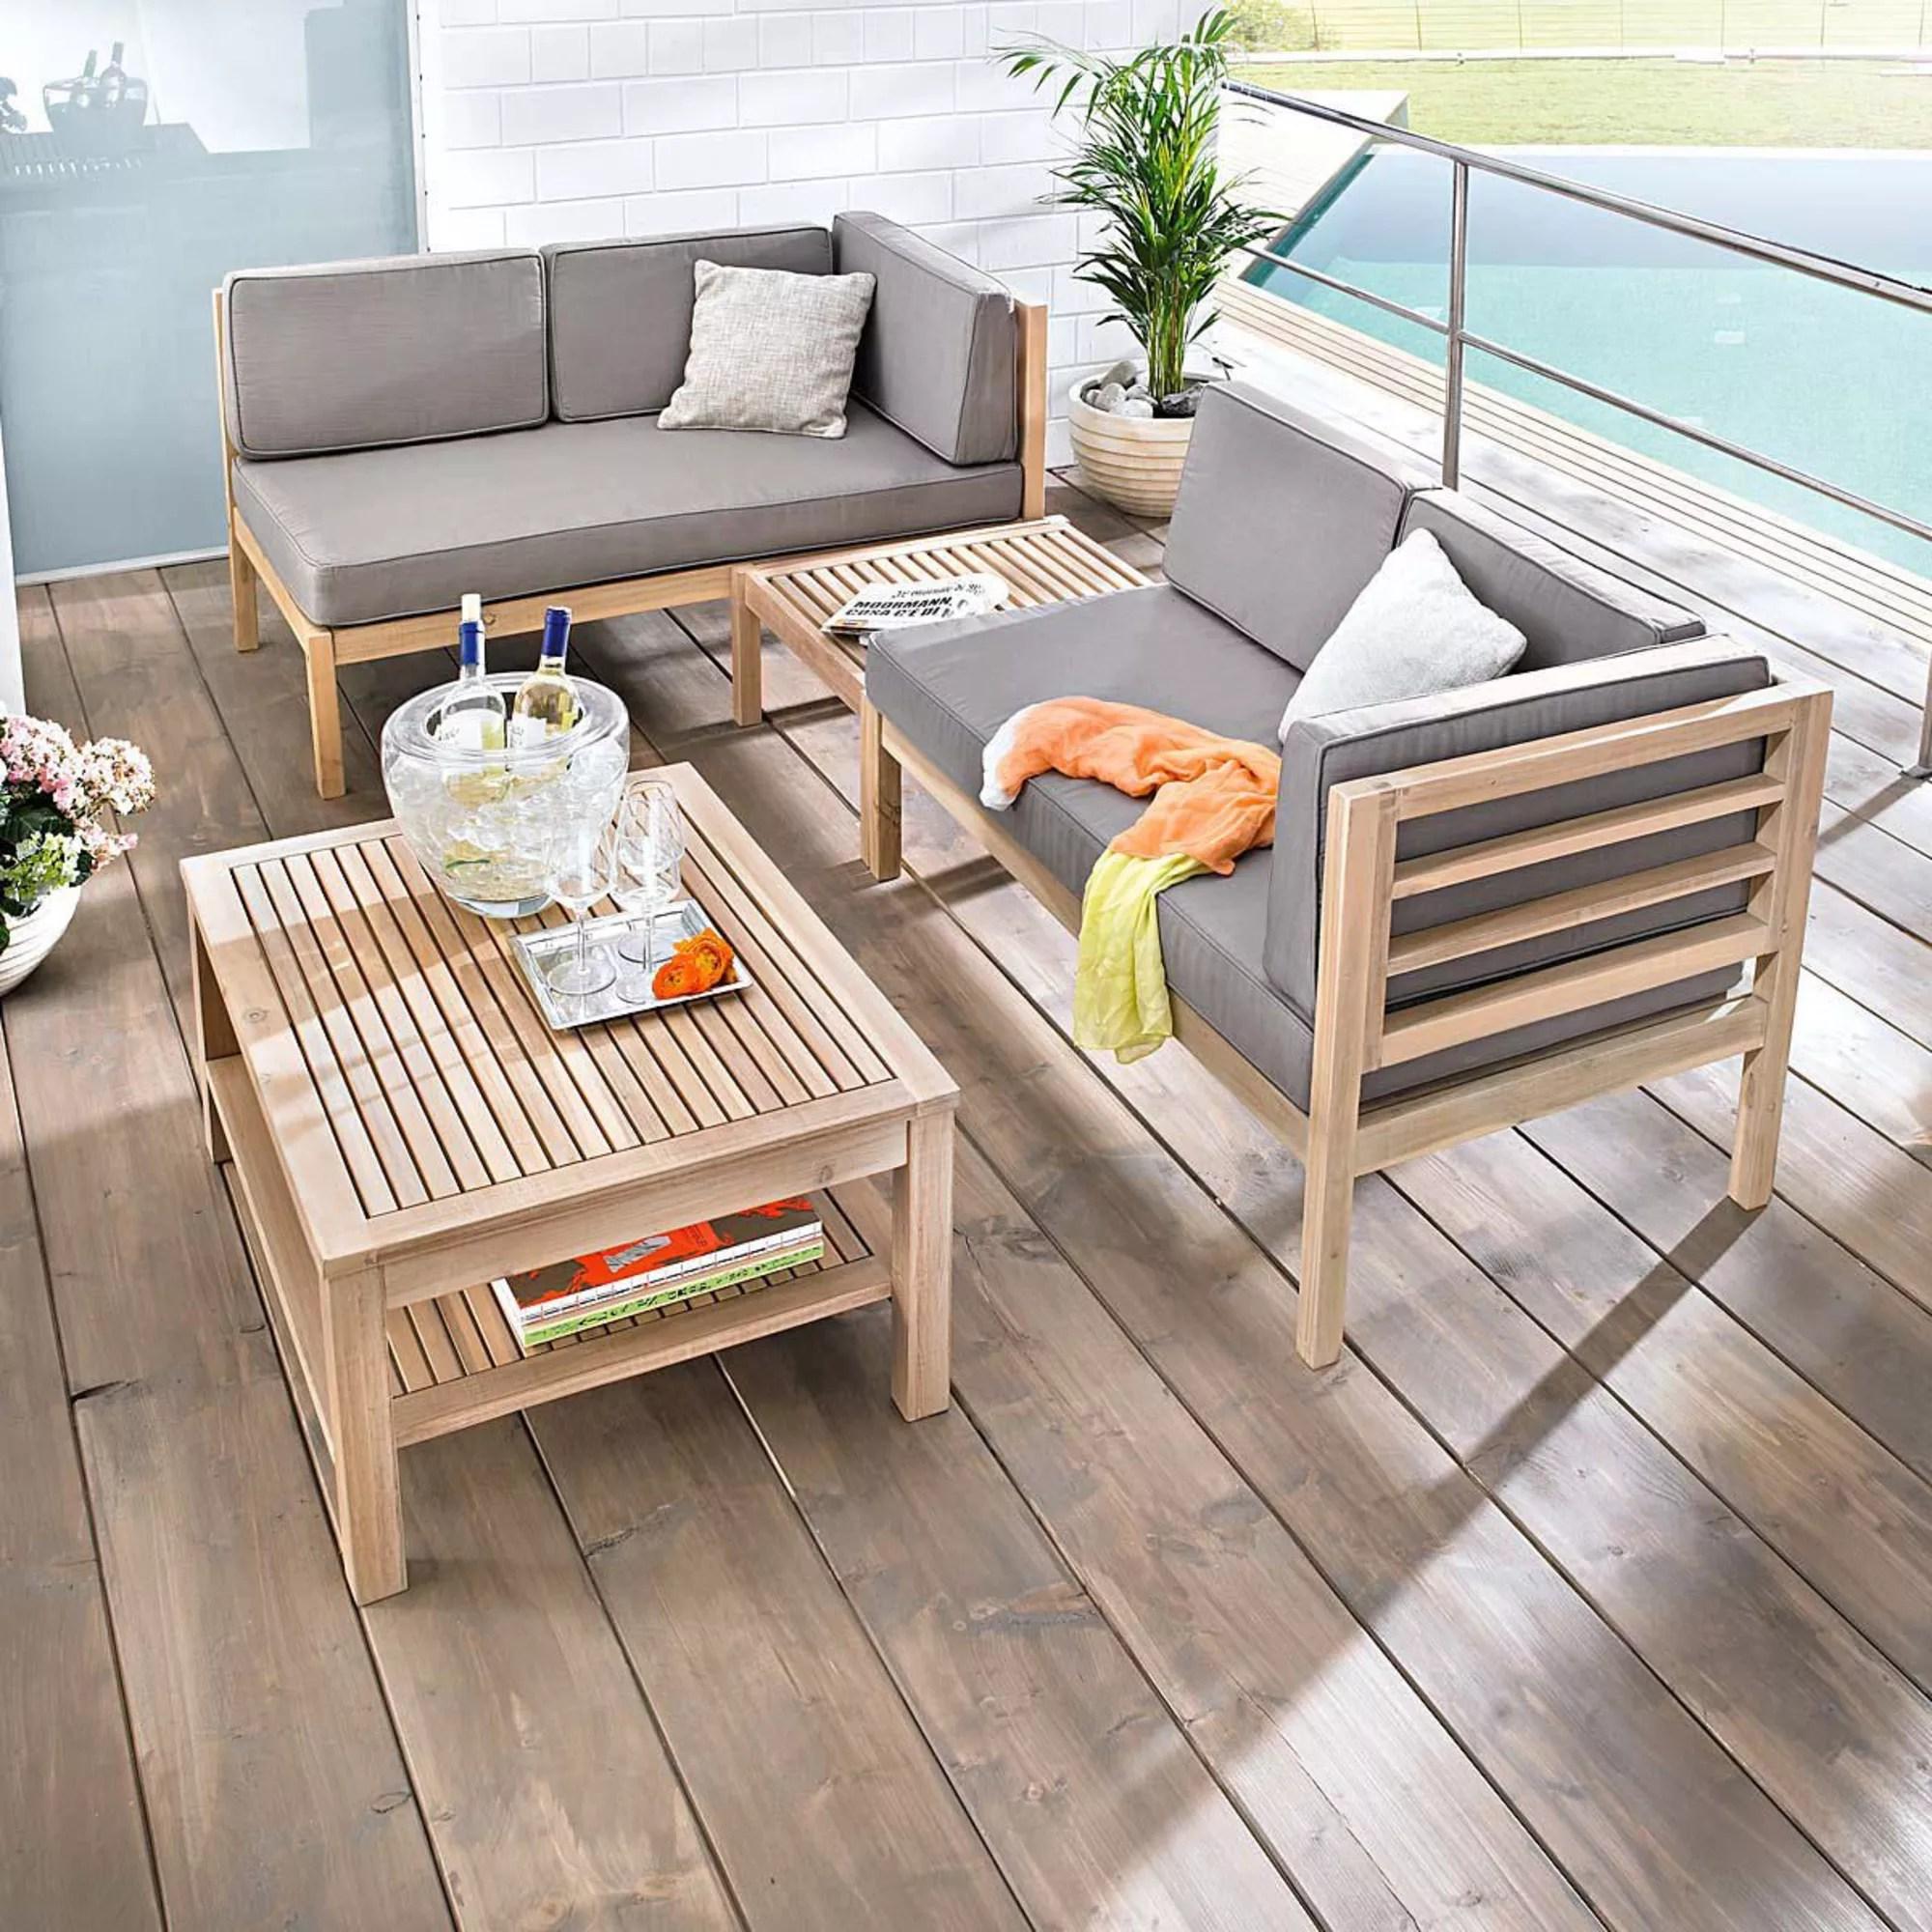 Platzsparende Gartenmobel Gartenmobel Holz Set Hause Deko Ideen